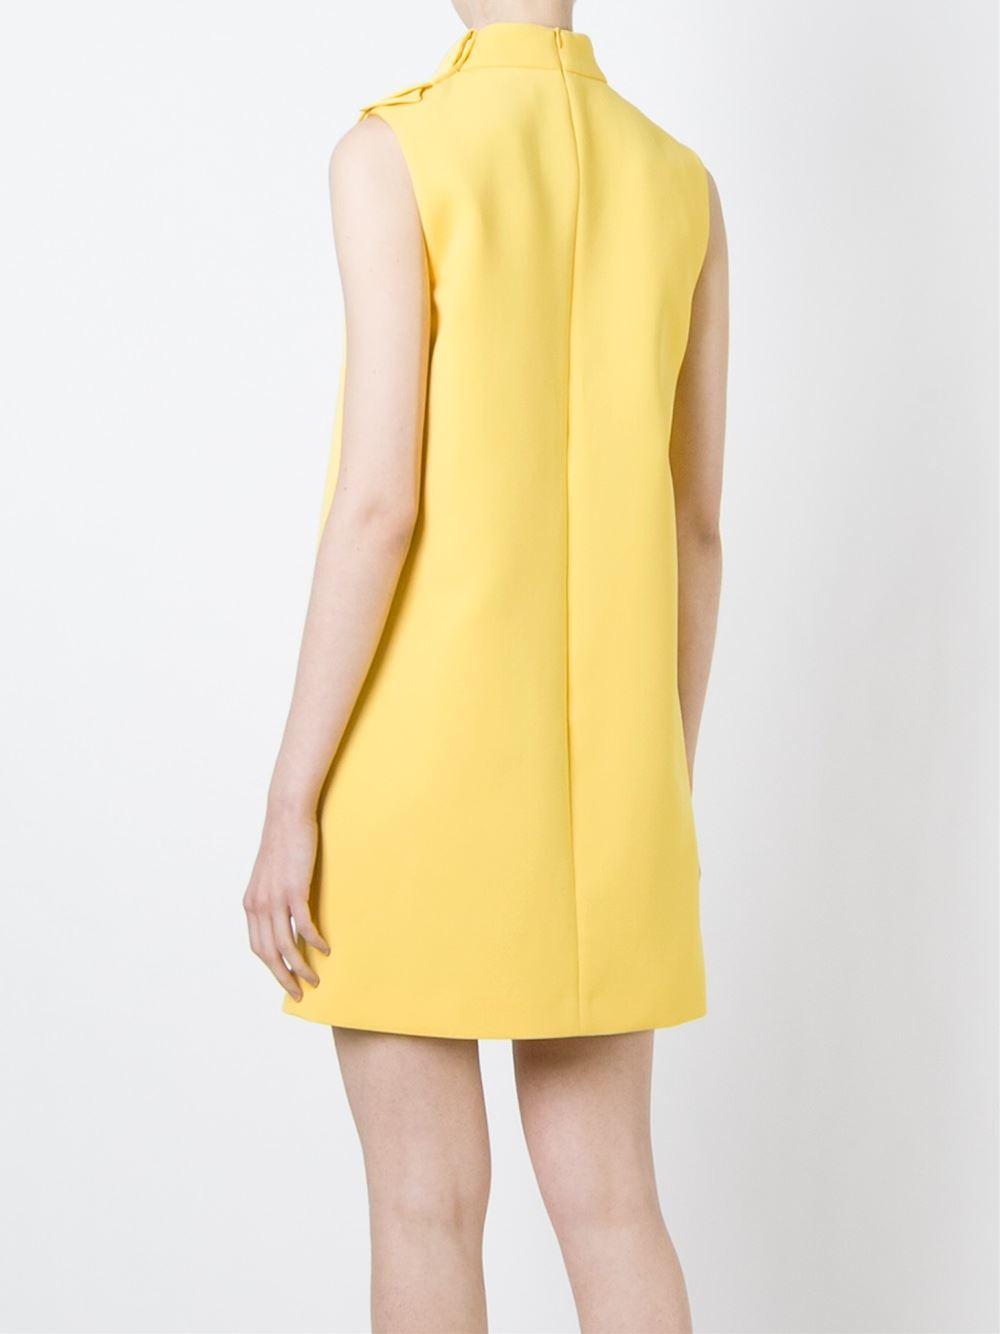 Red Valentino Sleeveless Shift Dress Women Cotton